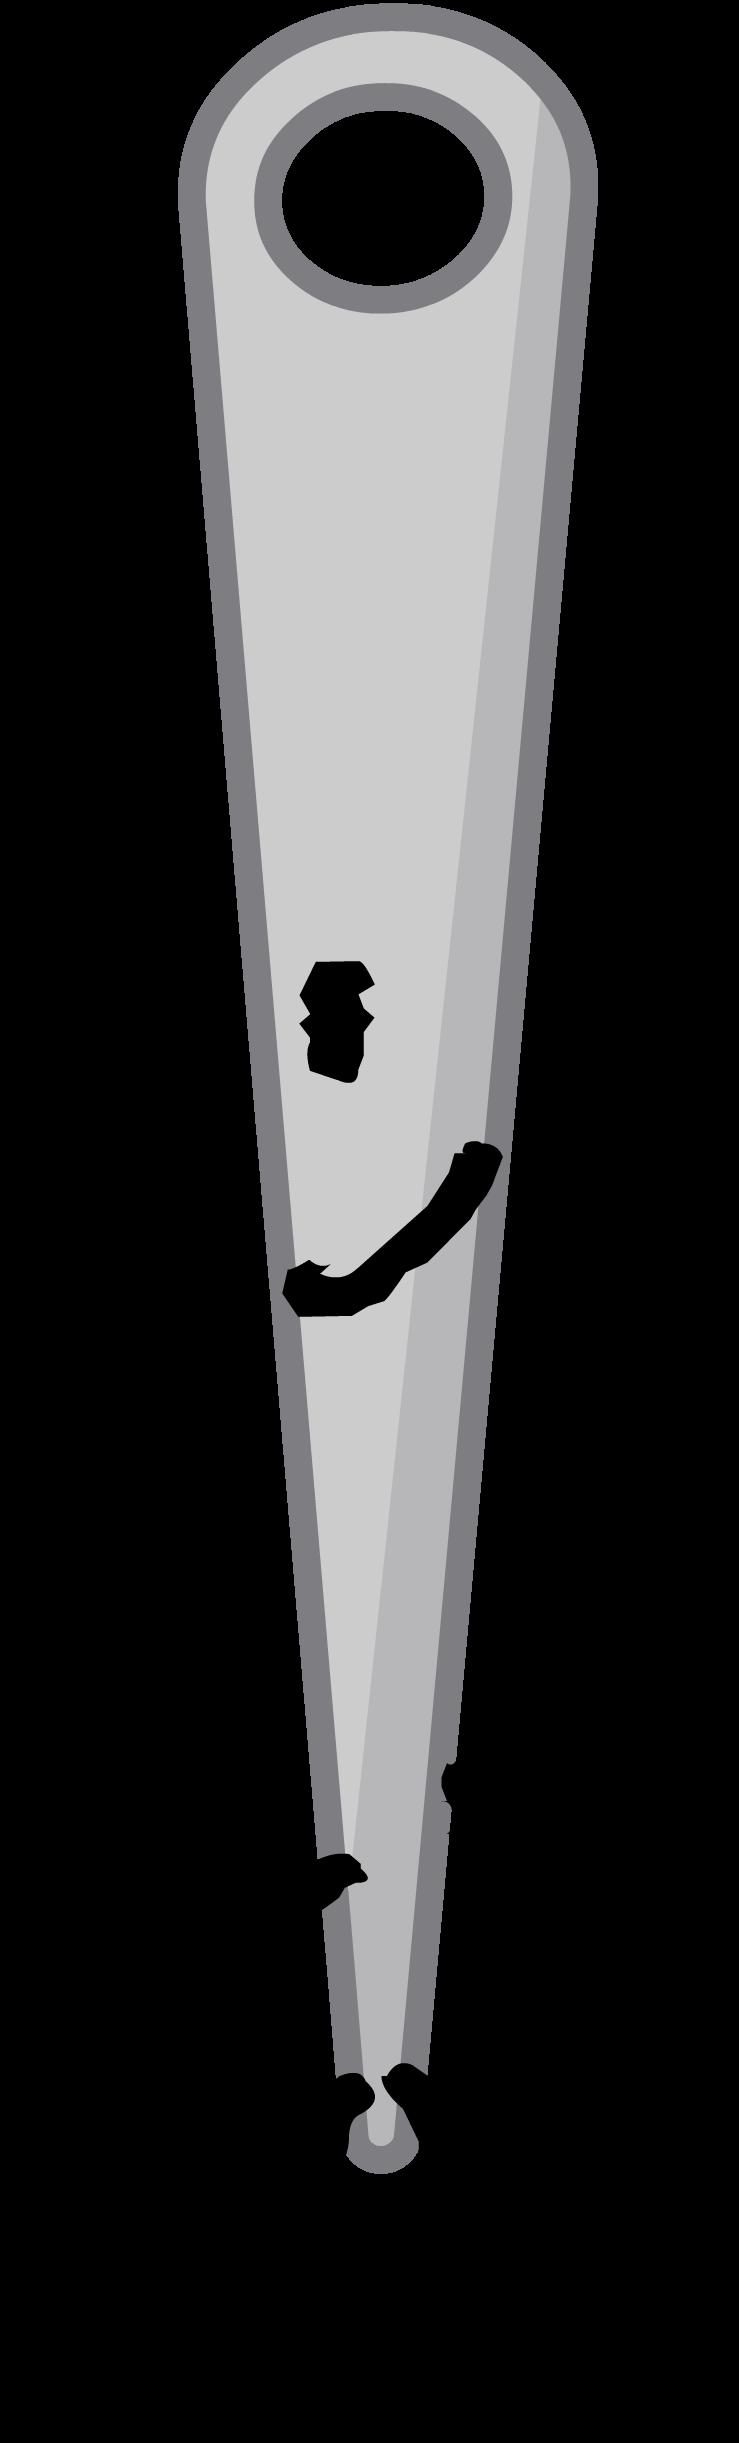 Needle | Battle for Dream Island Wiki | FANDOM powered by Wikia